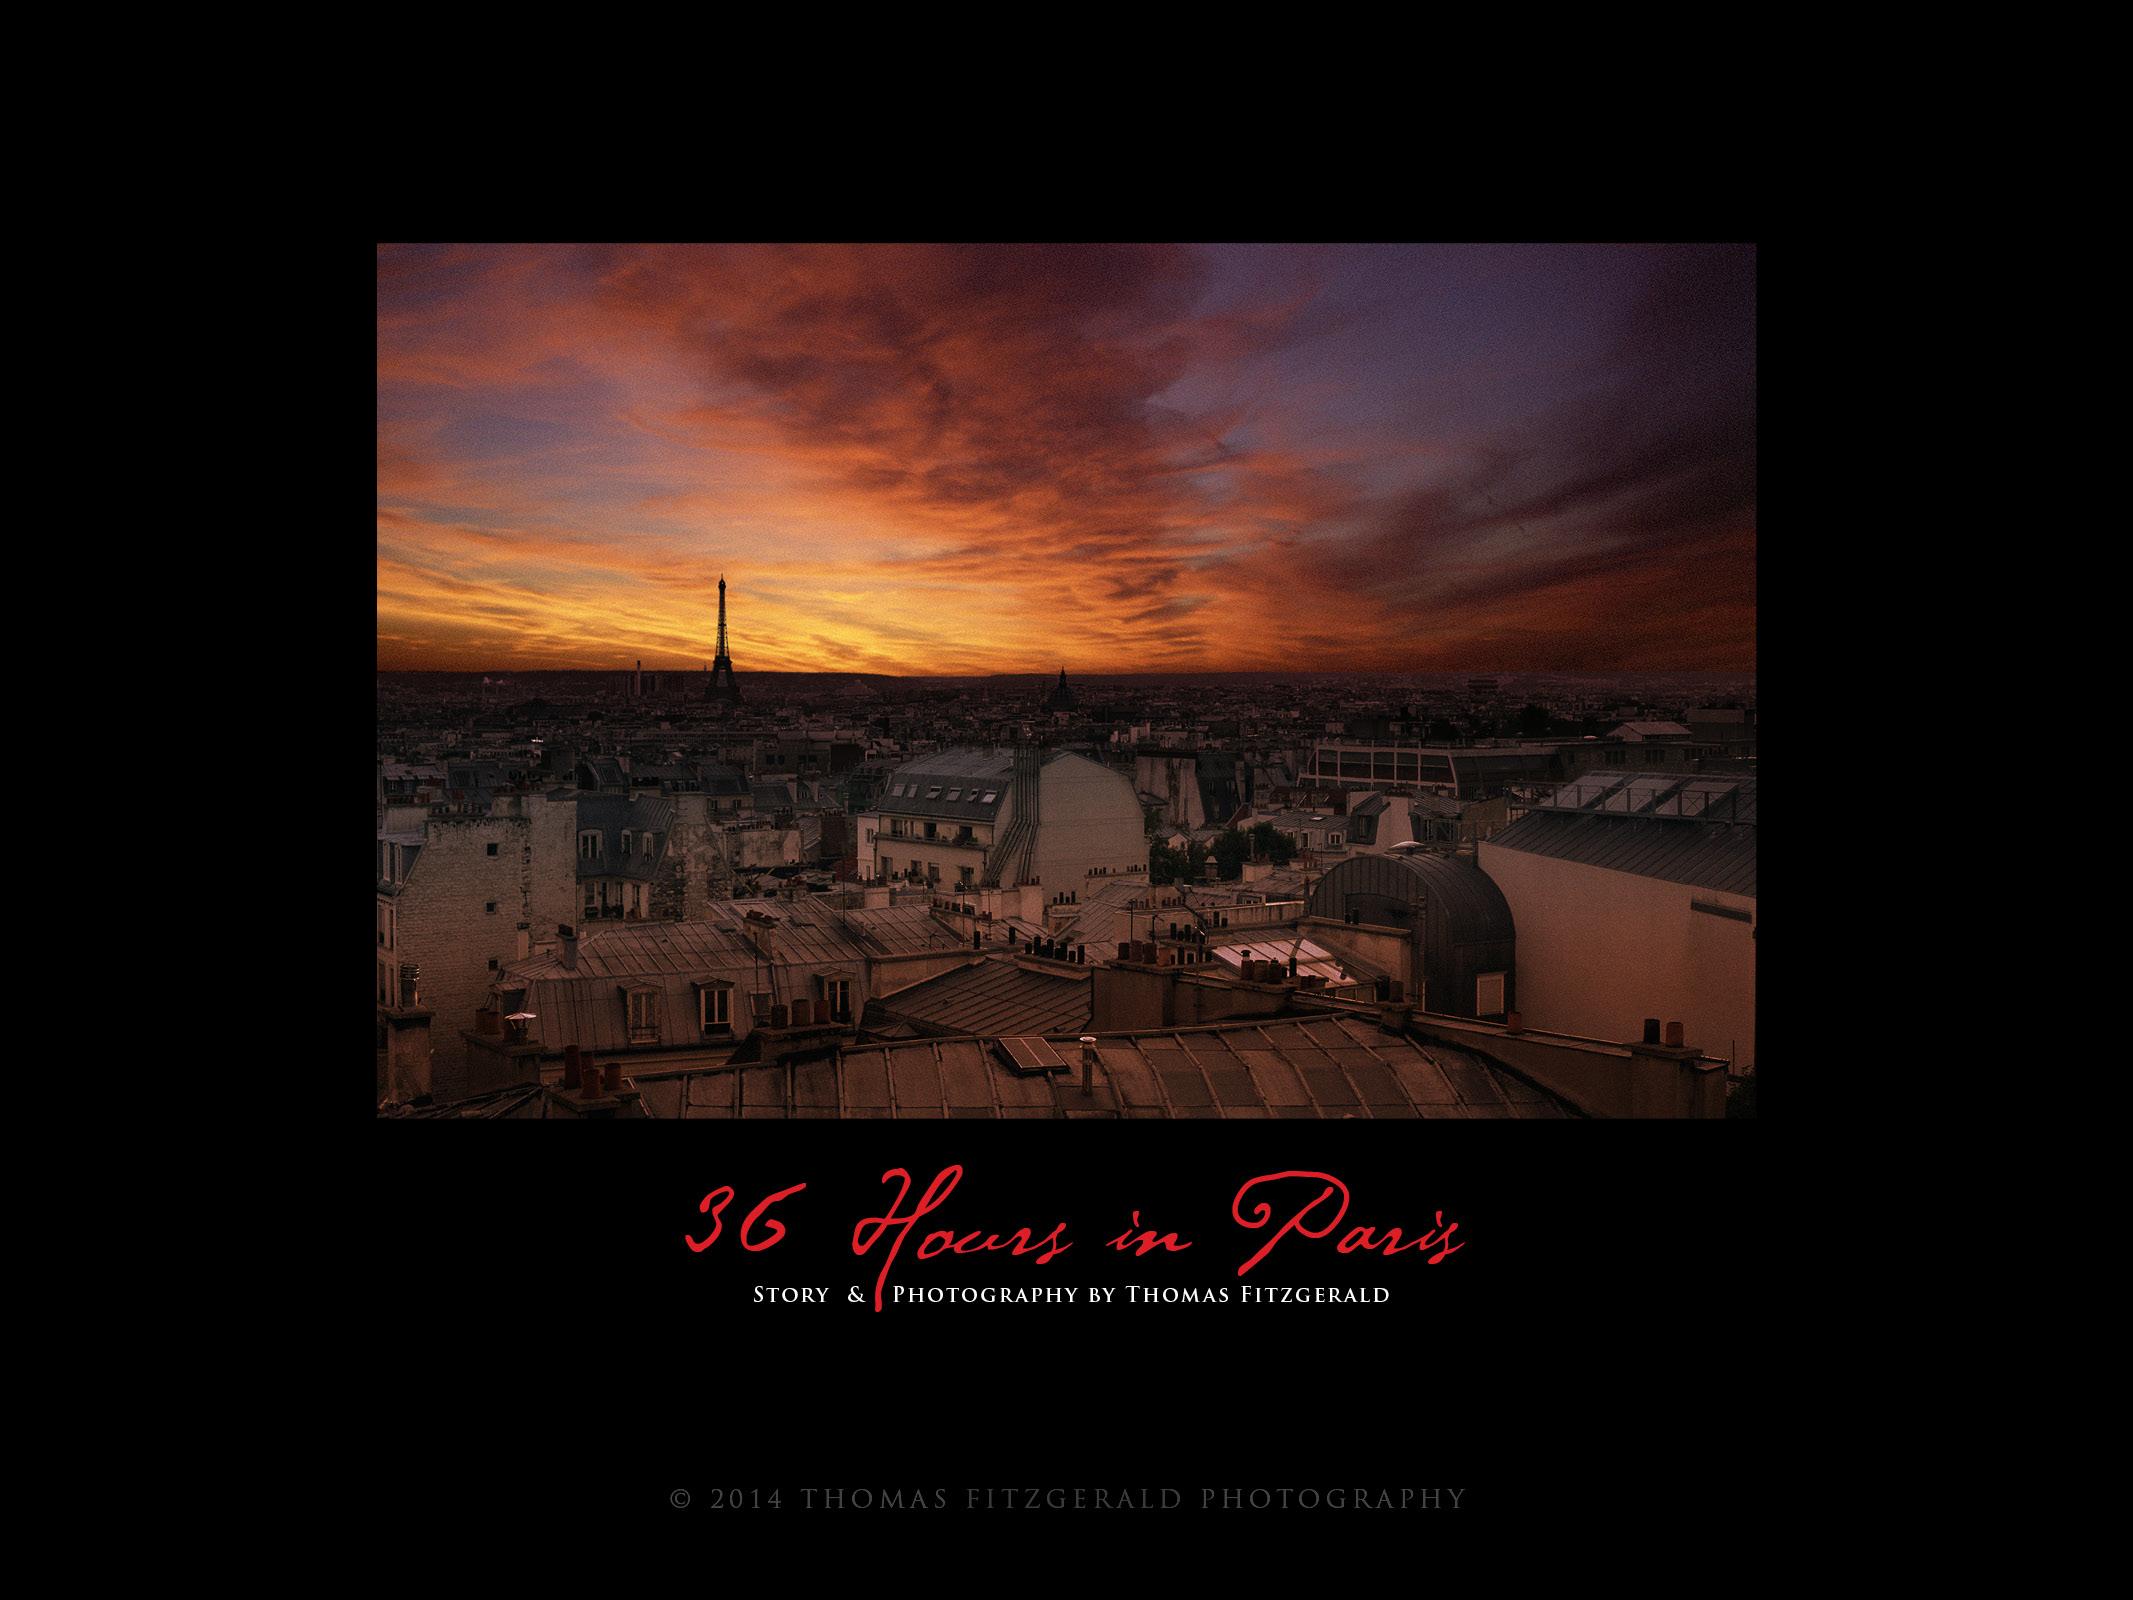 36-Hours-in-Paris-sample-92